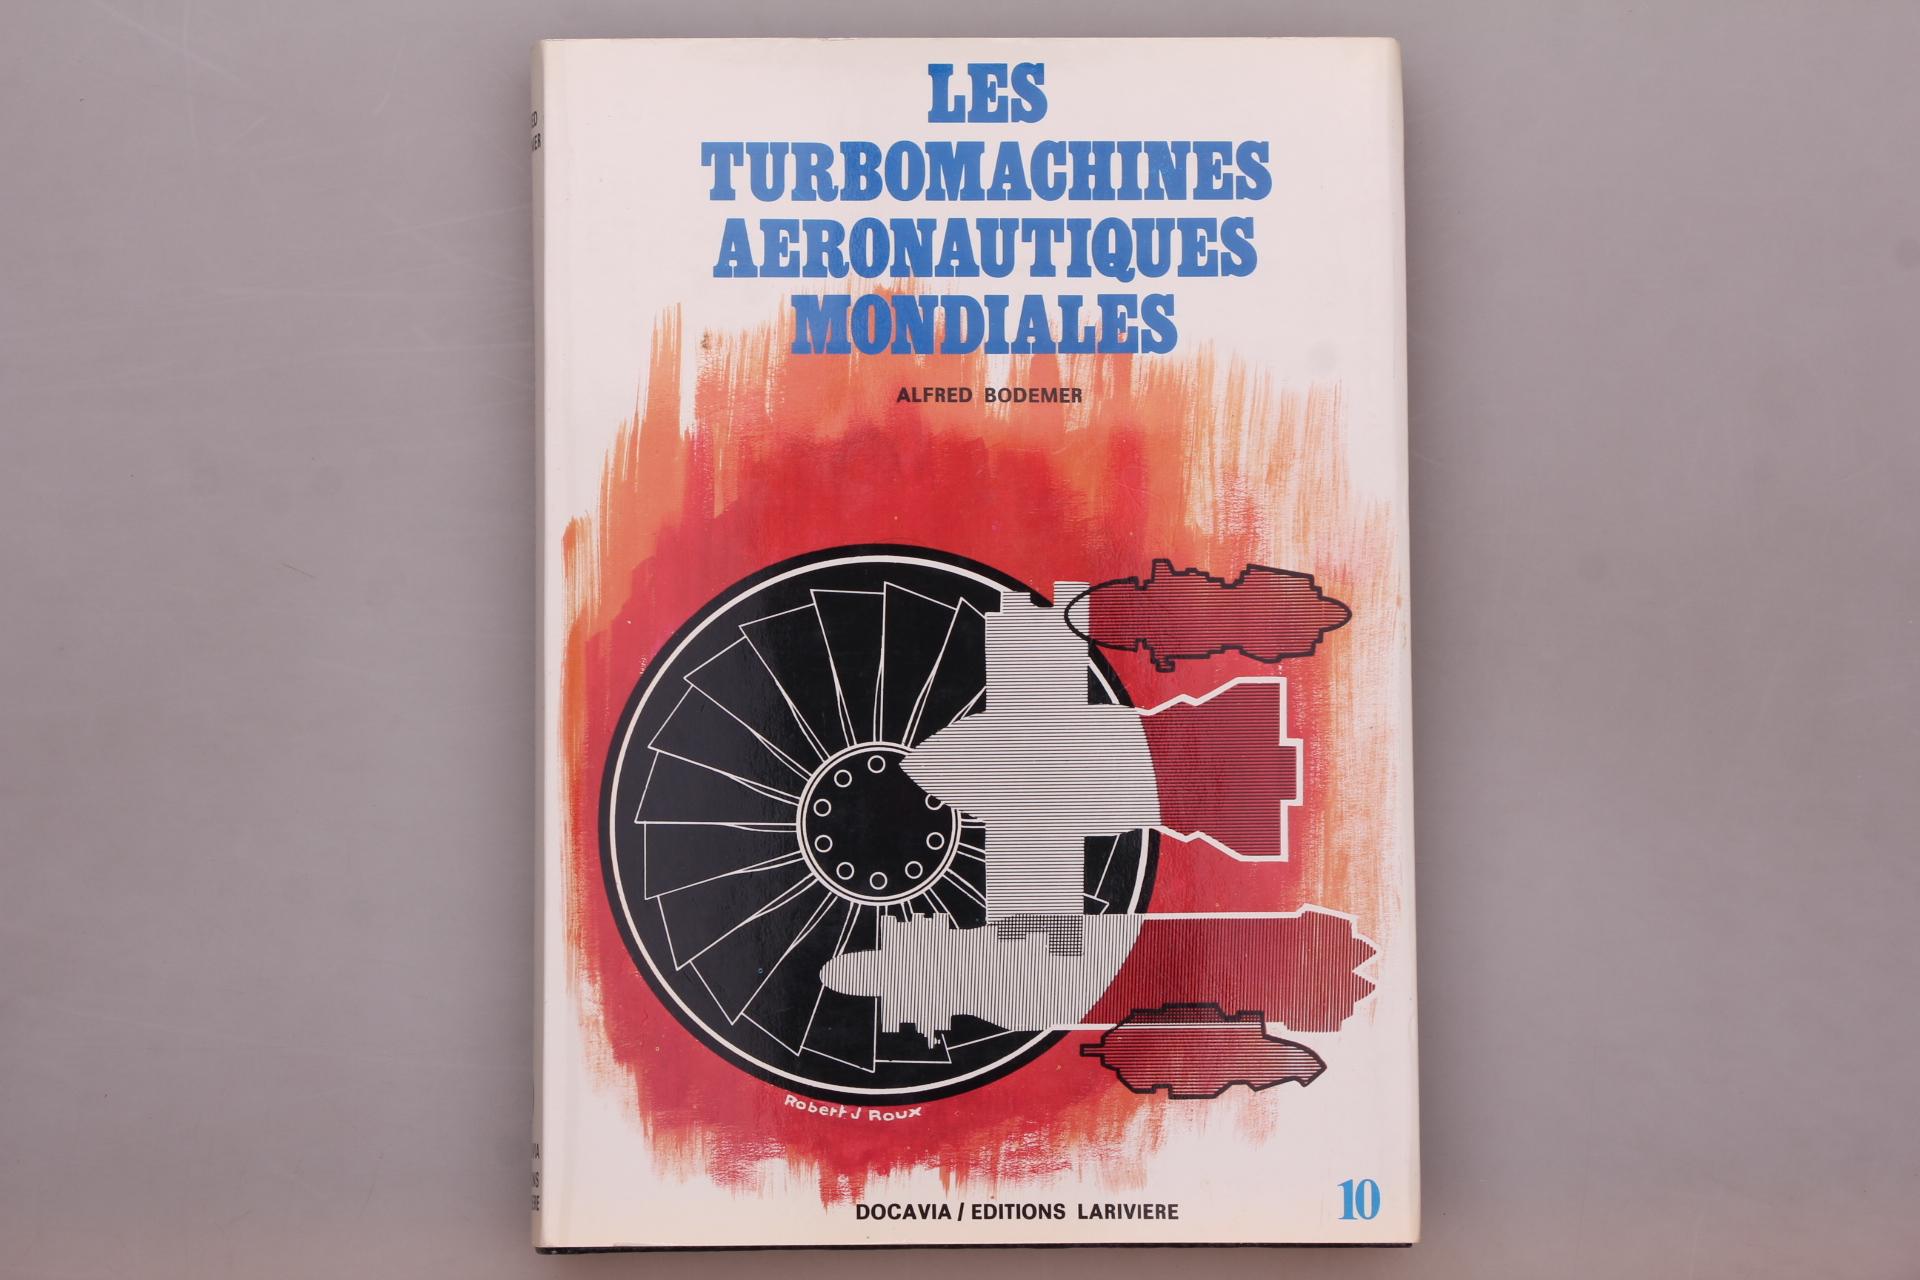 LES TURBOMACHINES AERONAUTIQUES MONDIALES